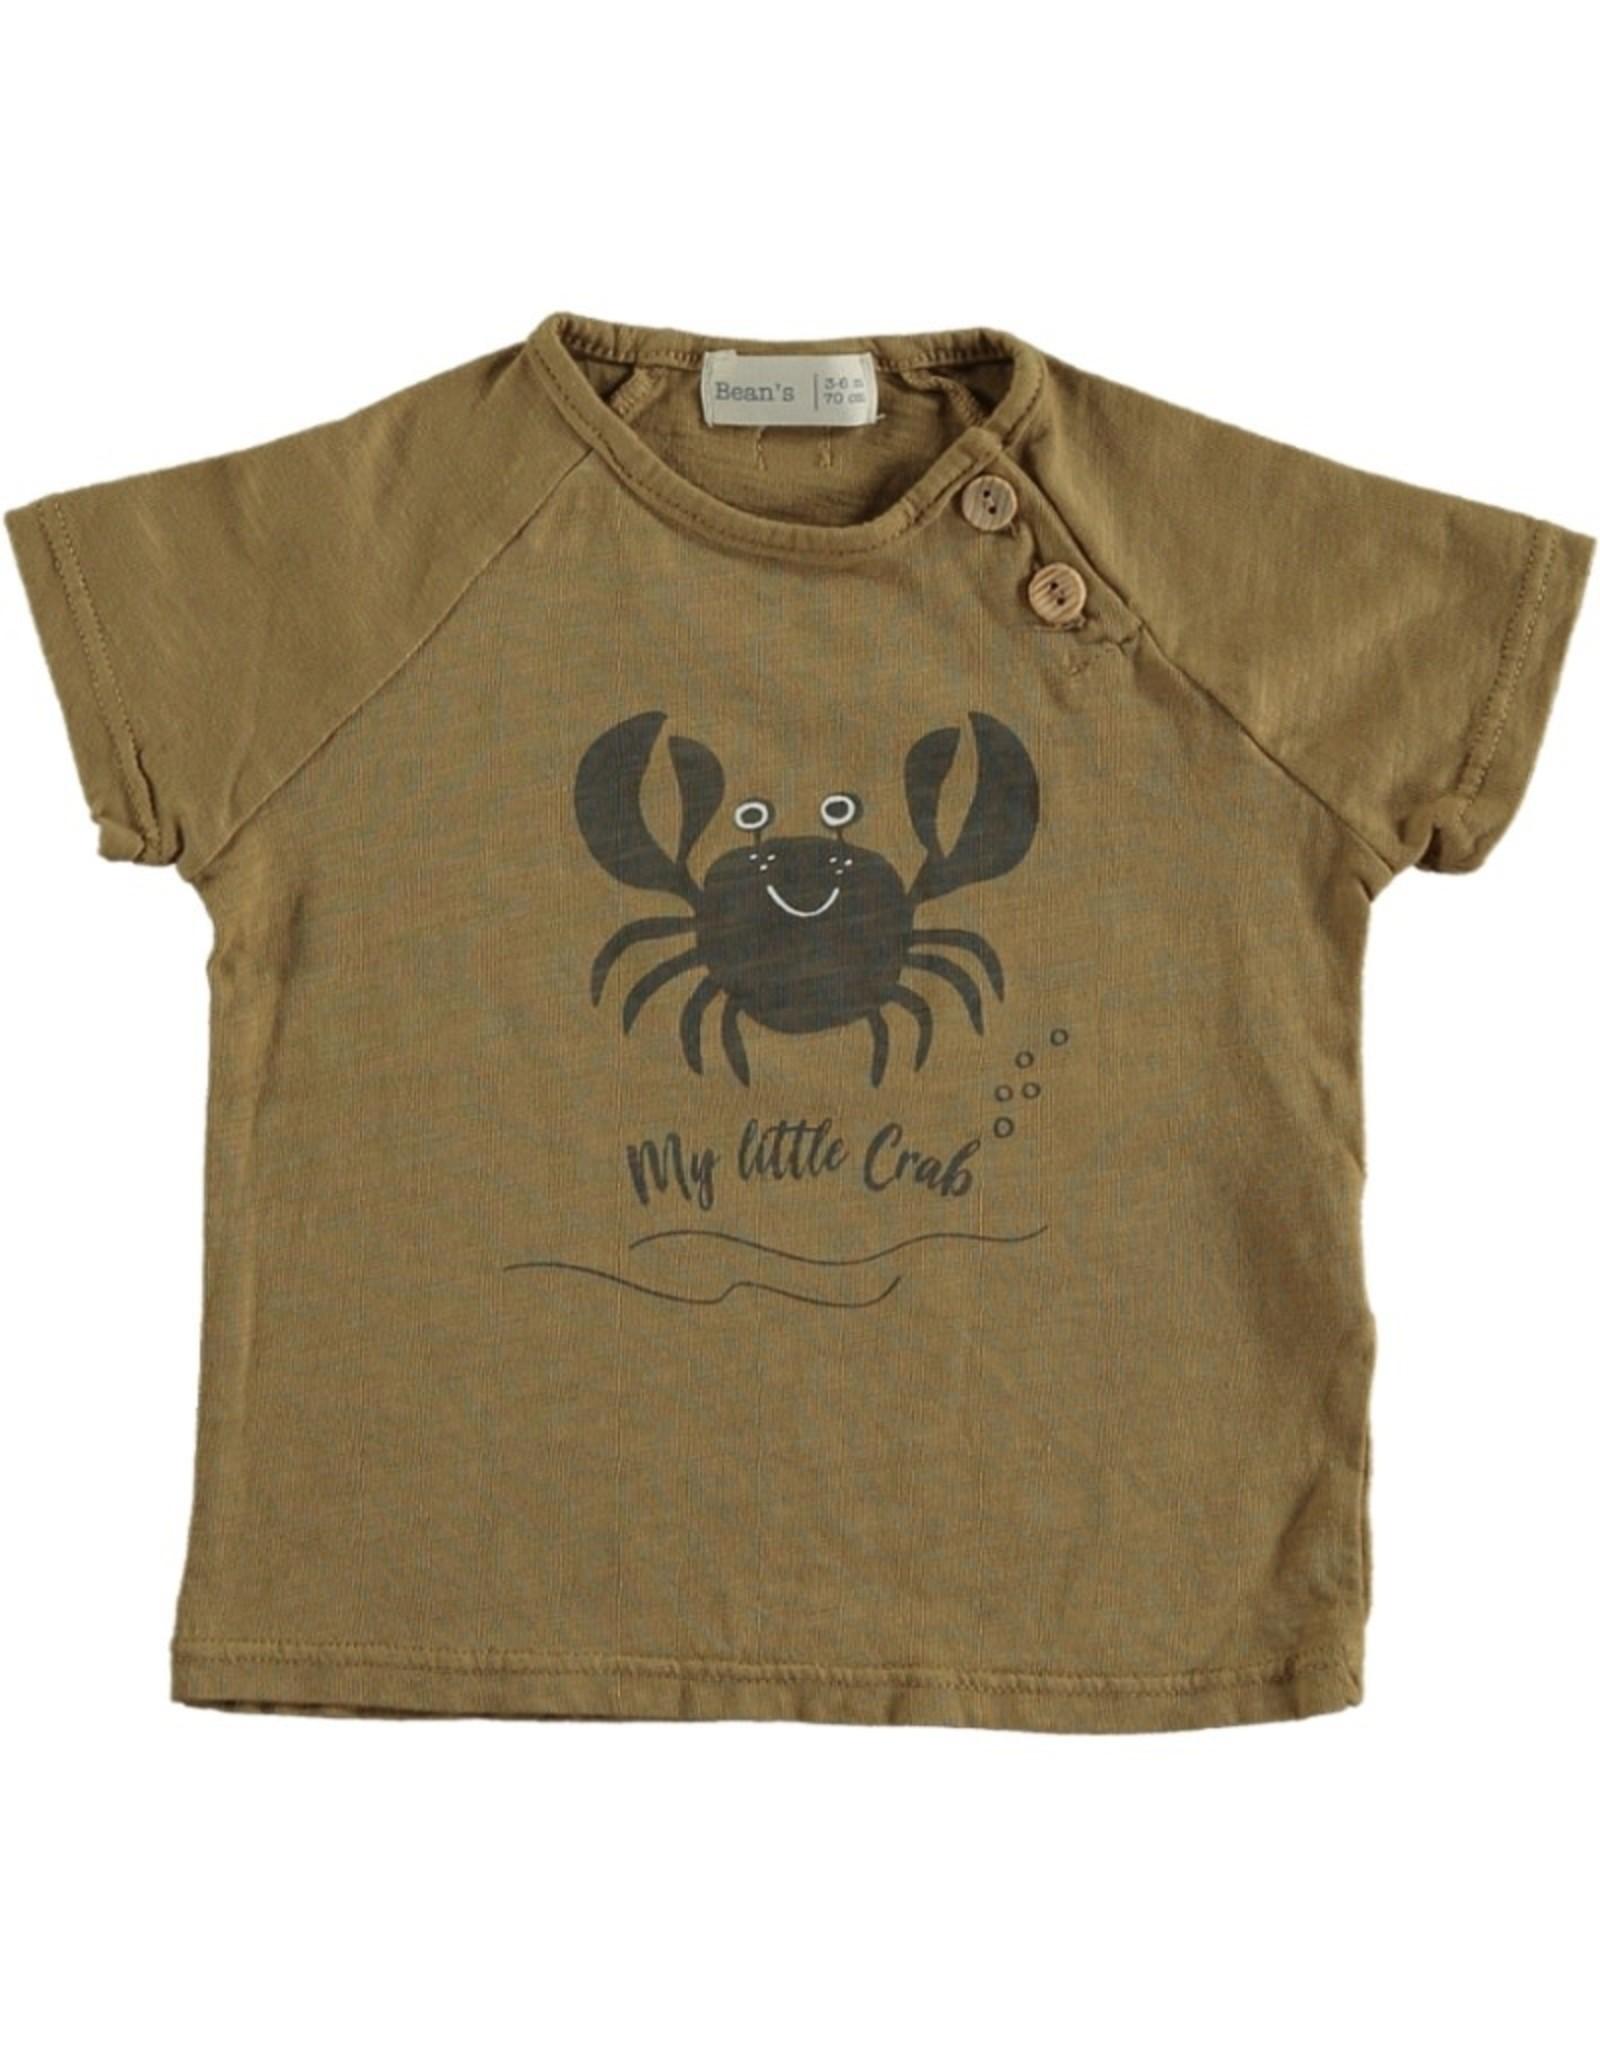 Beans Barcelona Beans Barcelona CLOWNFISH-Crab Cotton T-shirt Camel